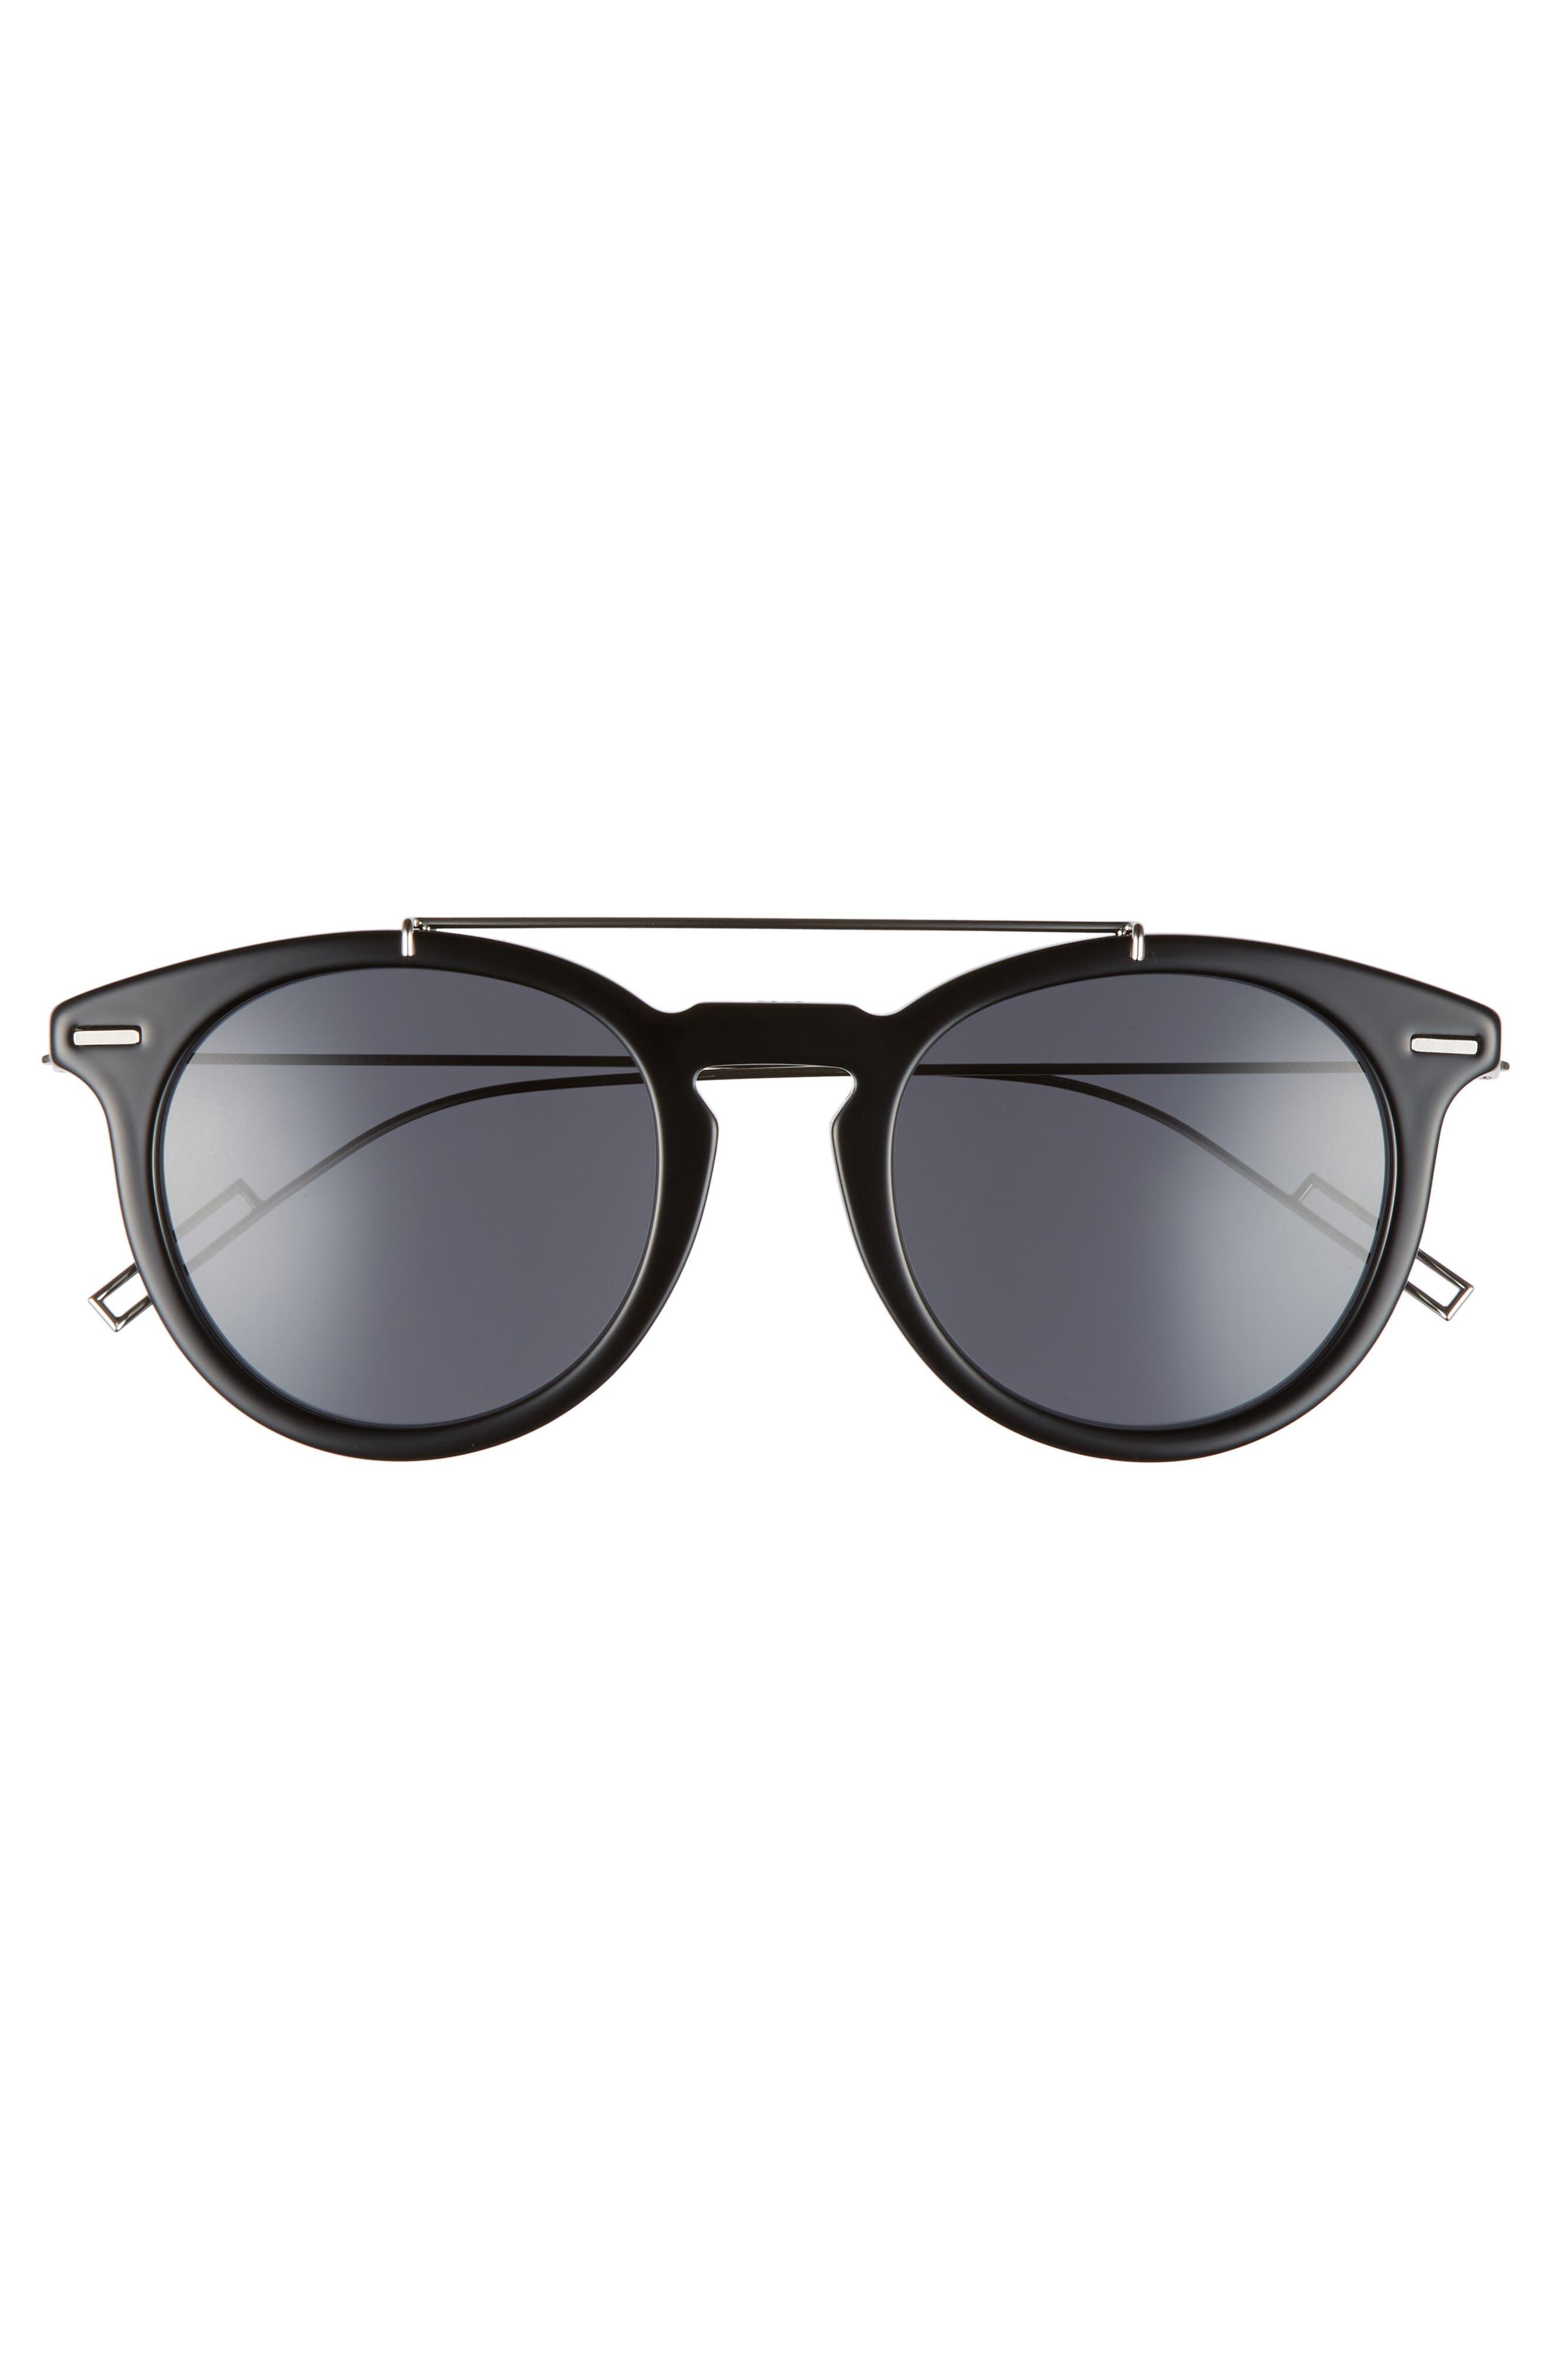 DIOR,                             Master 51mm Sunglasses,                             Alternate thumbnail 2, color,                             BLACK